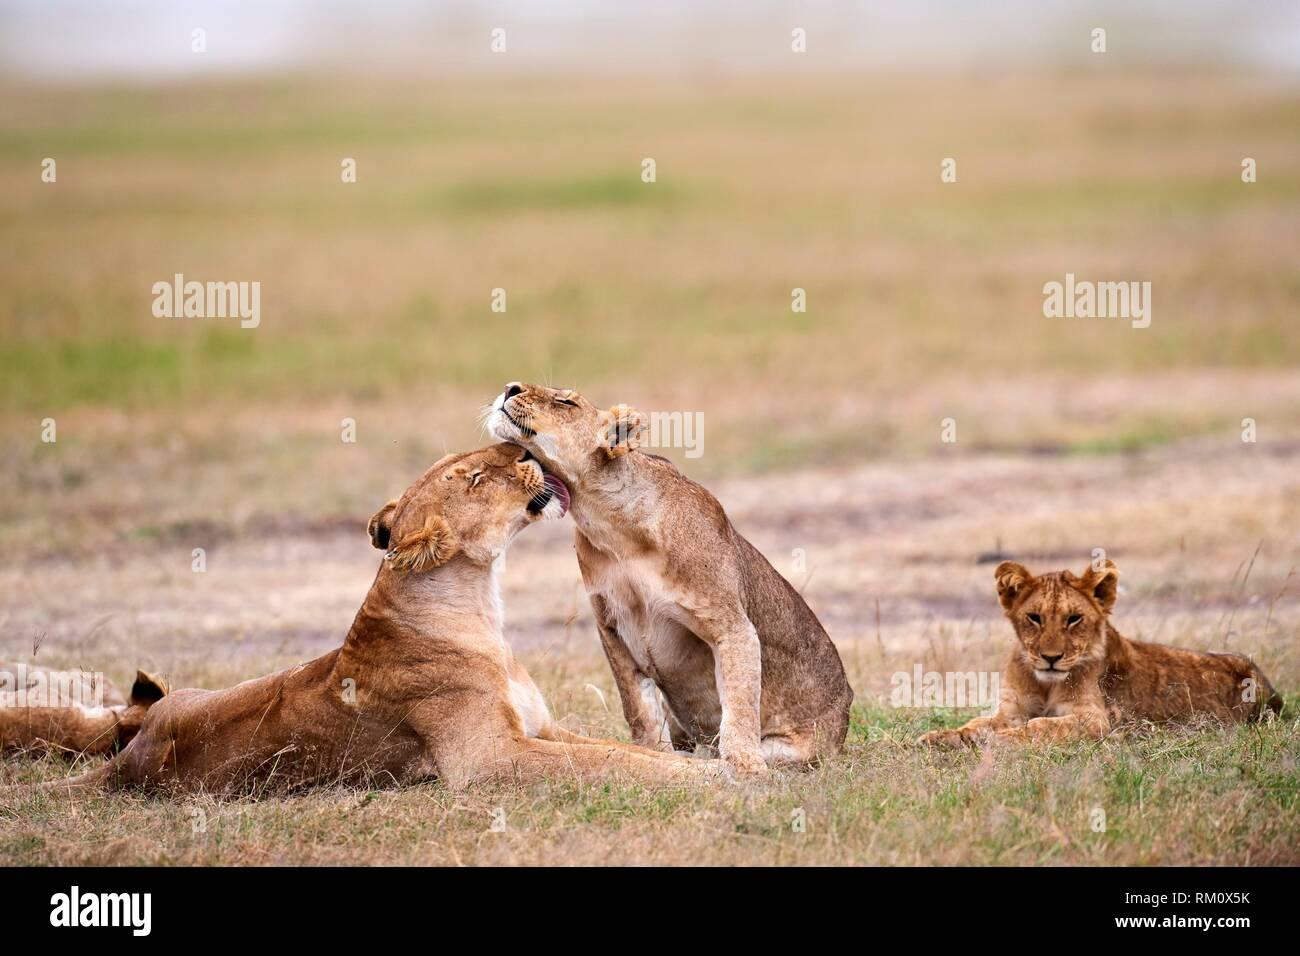 African Lion (Panthera leo), lionesses greeting, Masai Mara National Reserve, Kenya, Africa. - Stock Image